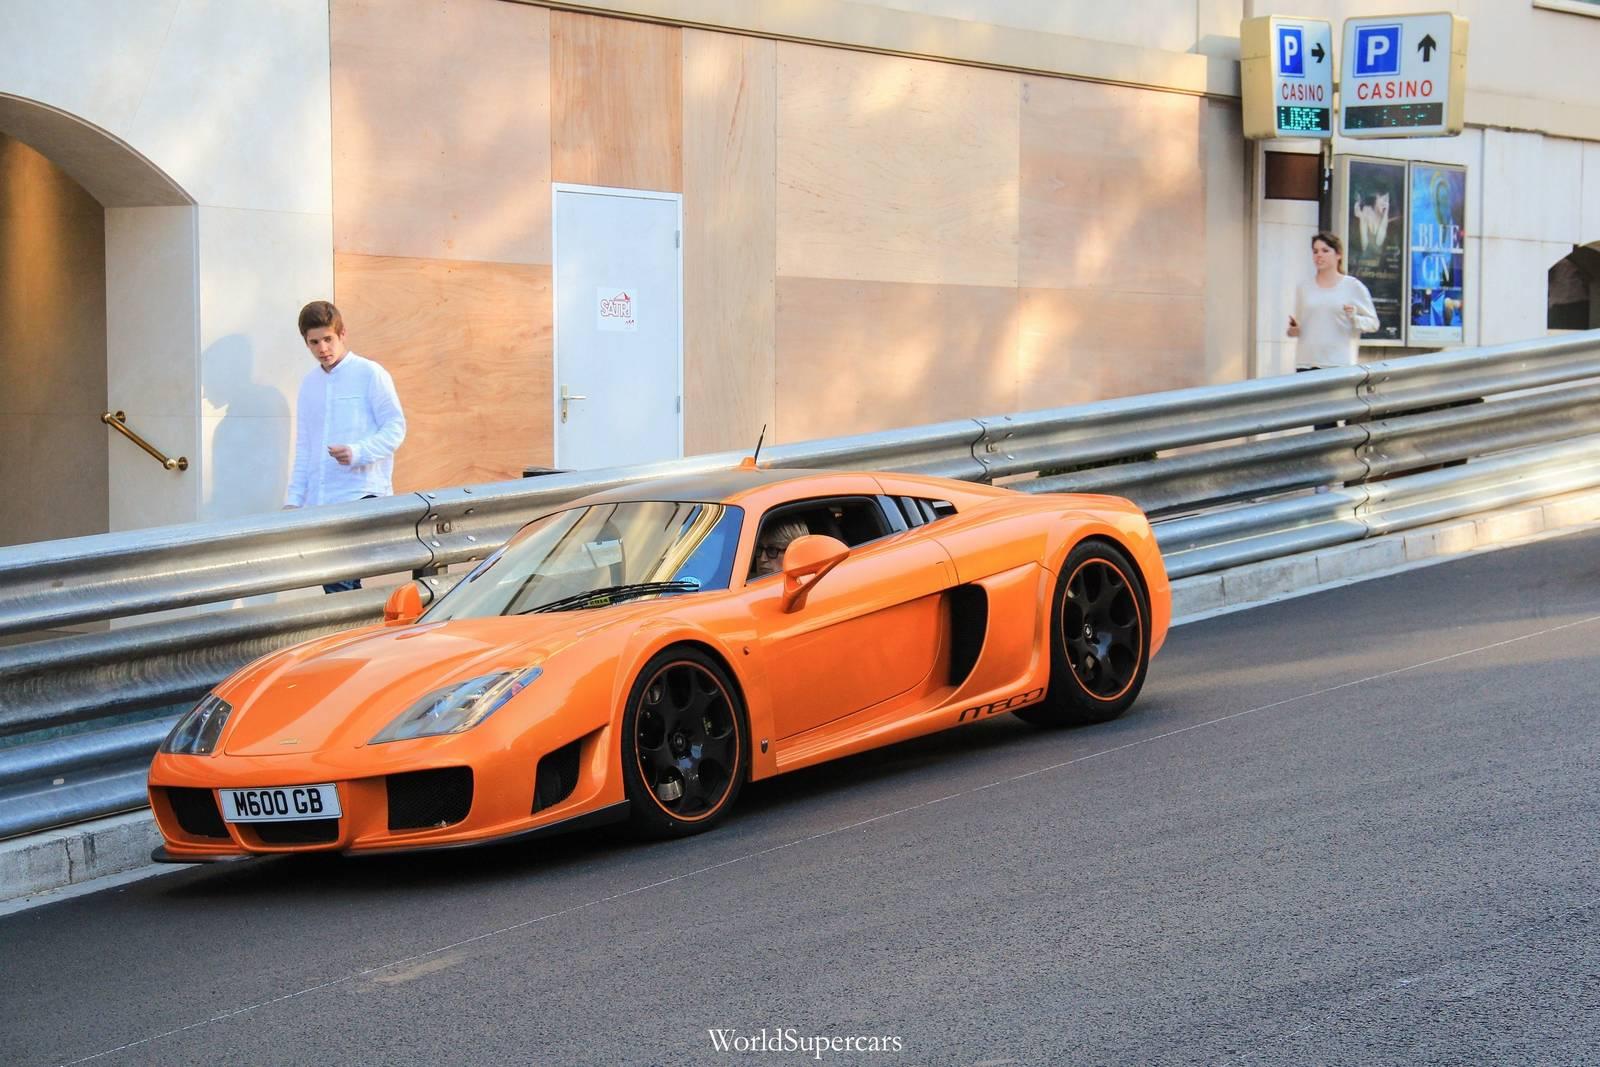 Video: Noble M600 Accelerations Through Monaco Streets